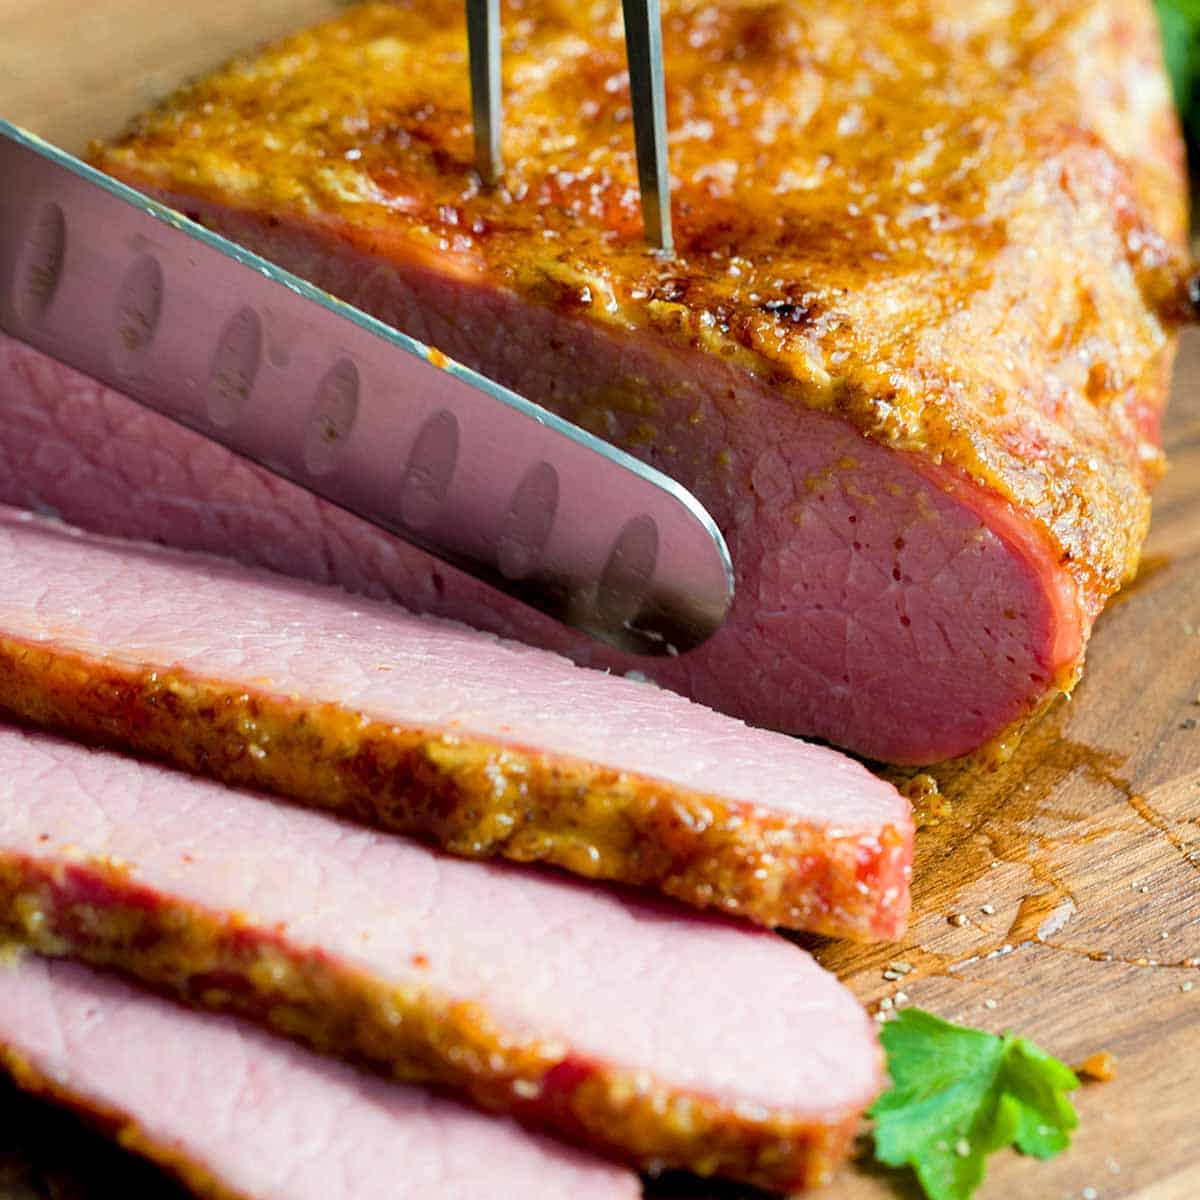 Oven-Baked Honey Mustard Corned Beef